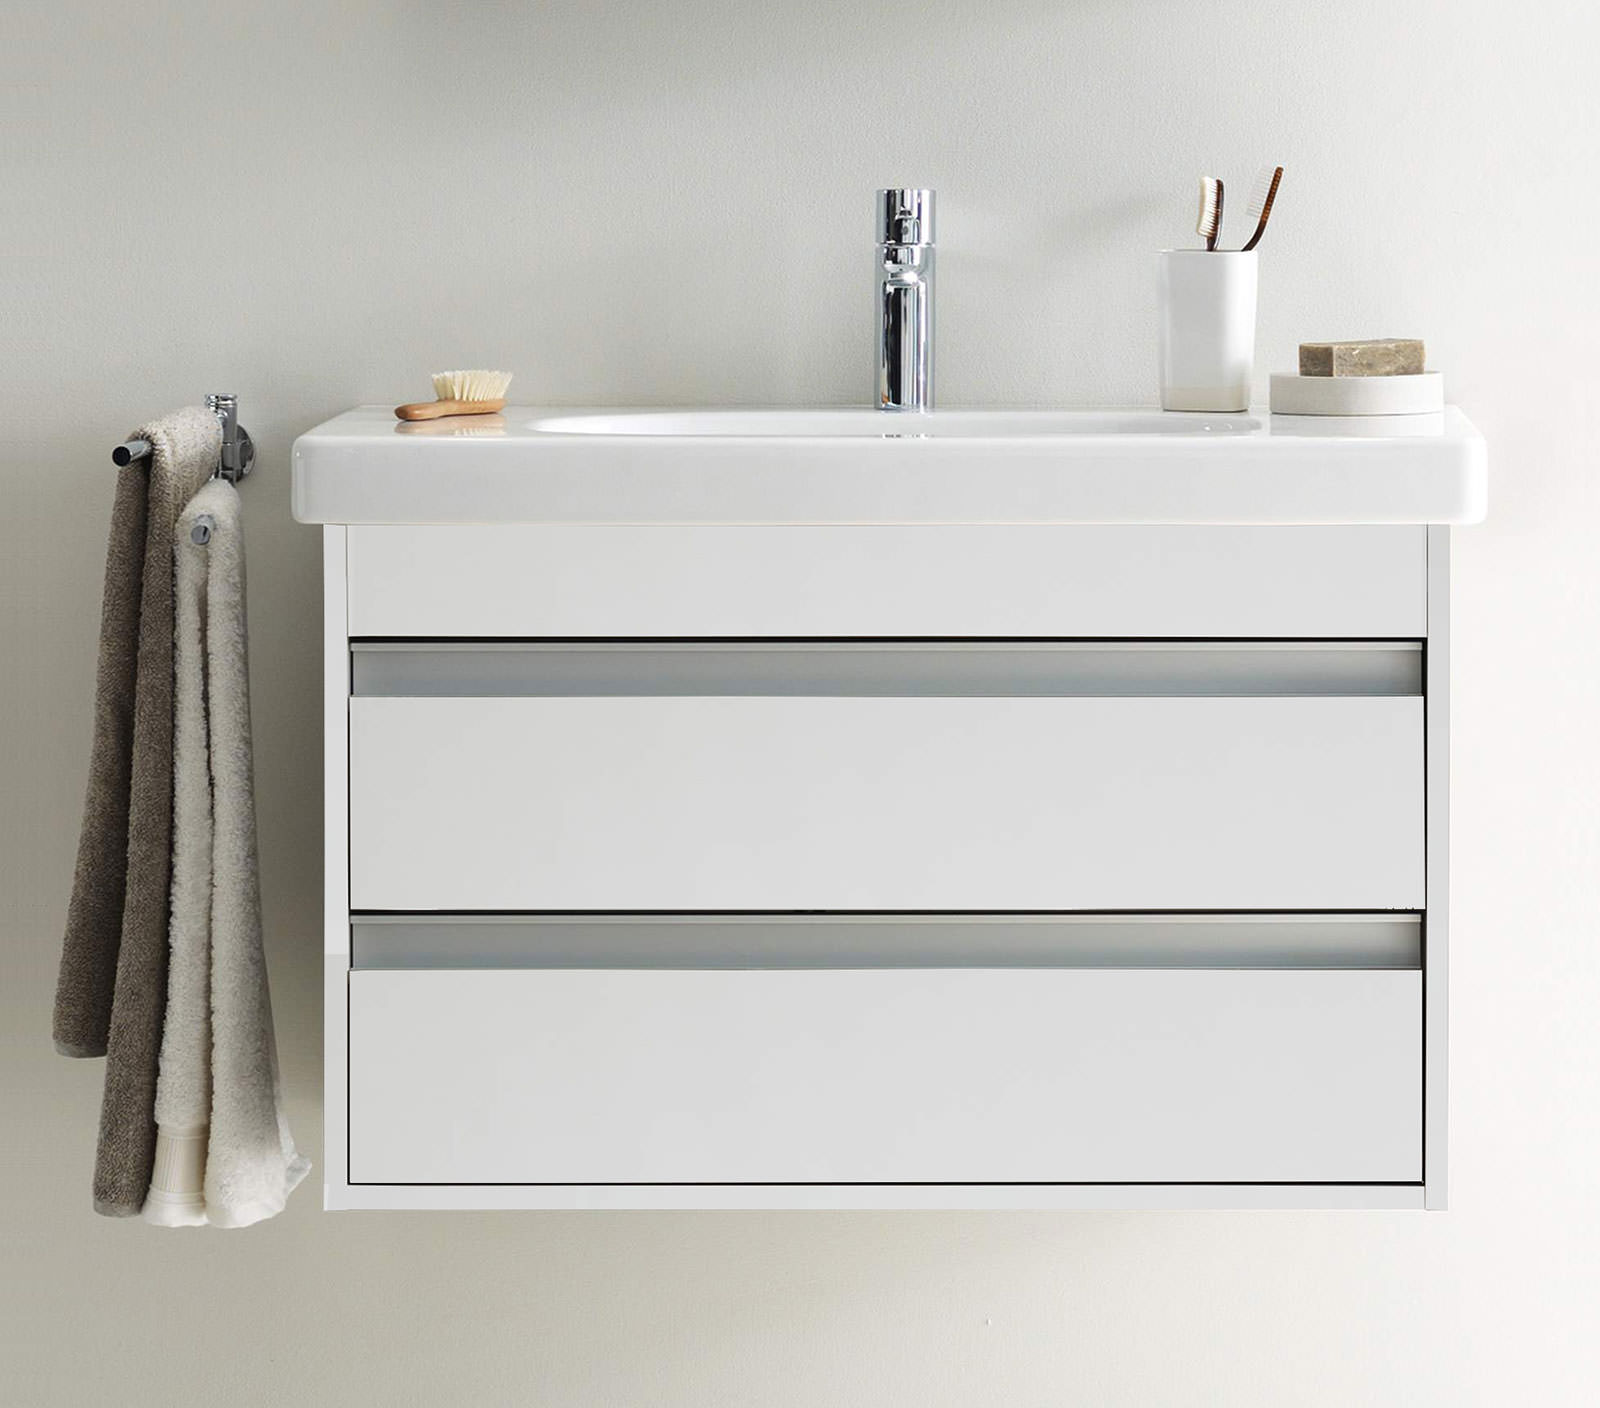 Duravit ketho 850mm 2 drawers unit with 850mm starck 3 - Duravit bathroom furniture uk ...